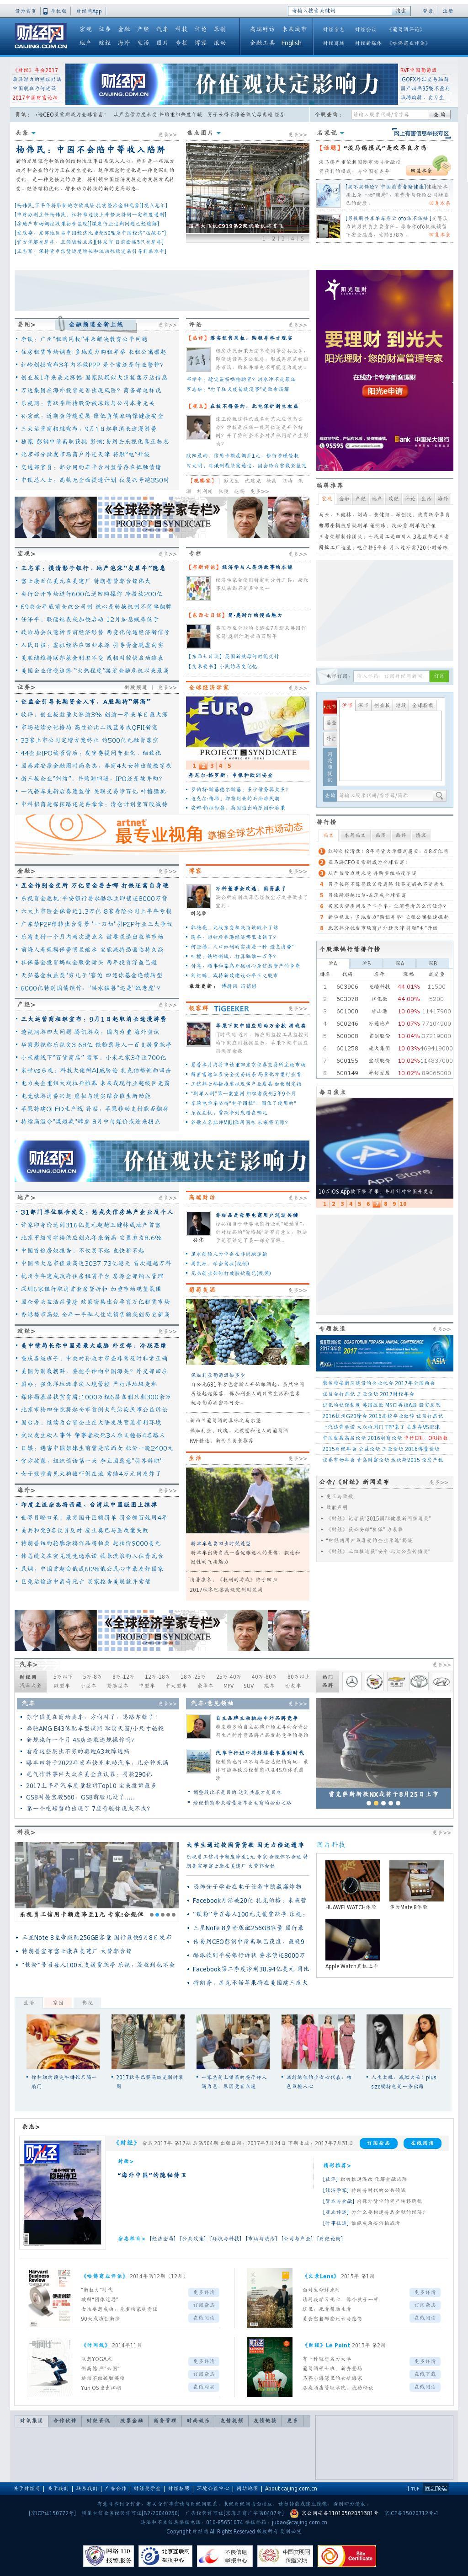 Caijing at Thursday July 27, 2017, 4:02 p.m. UTC